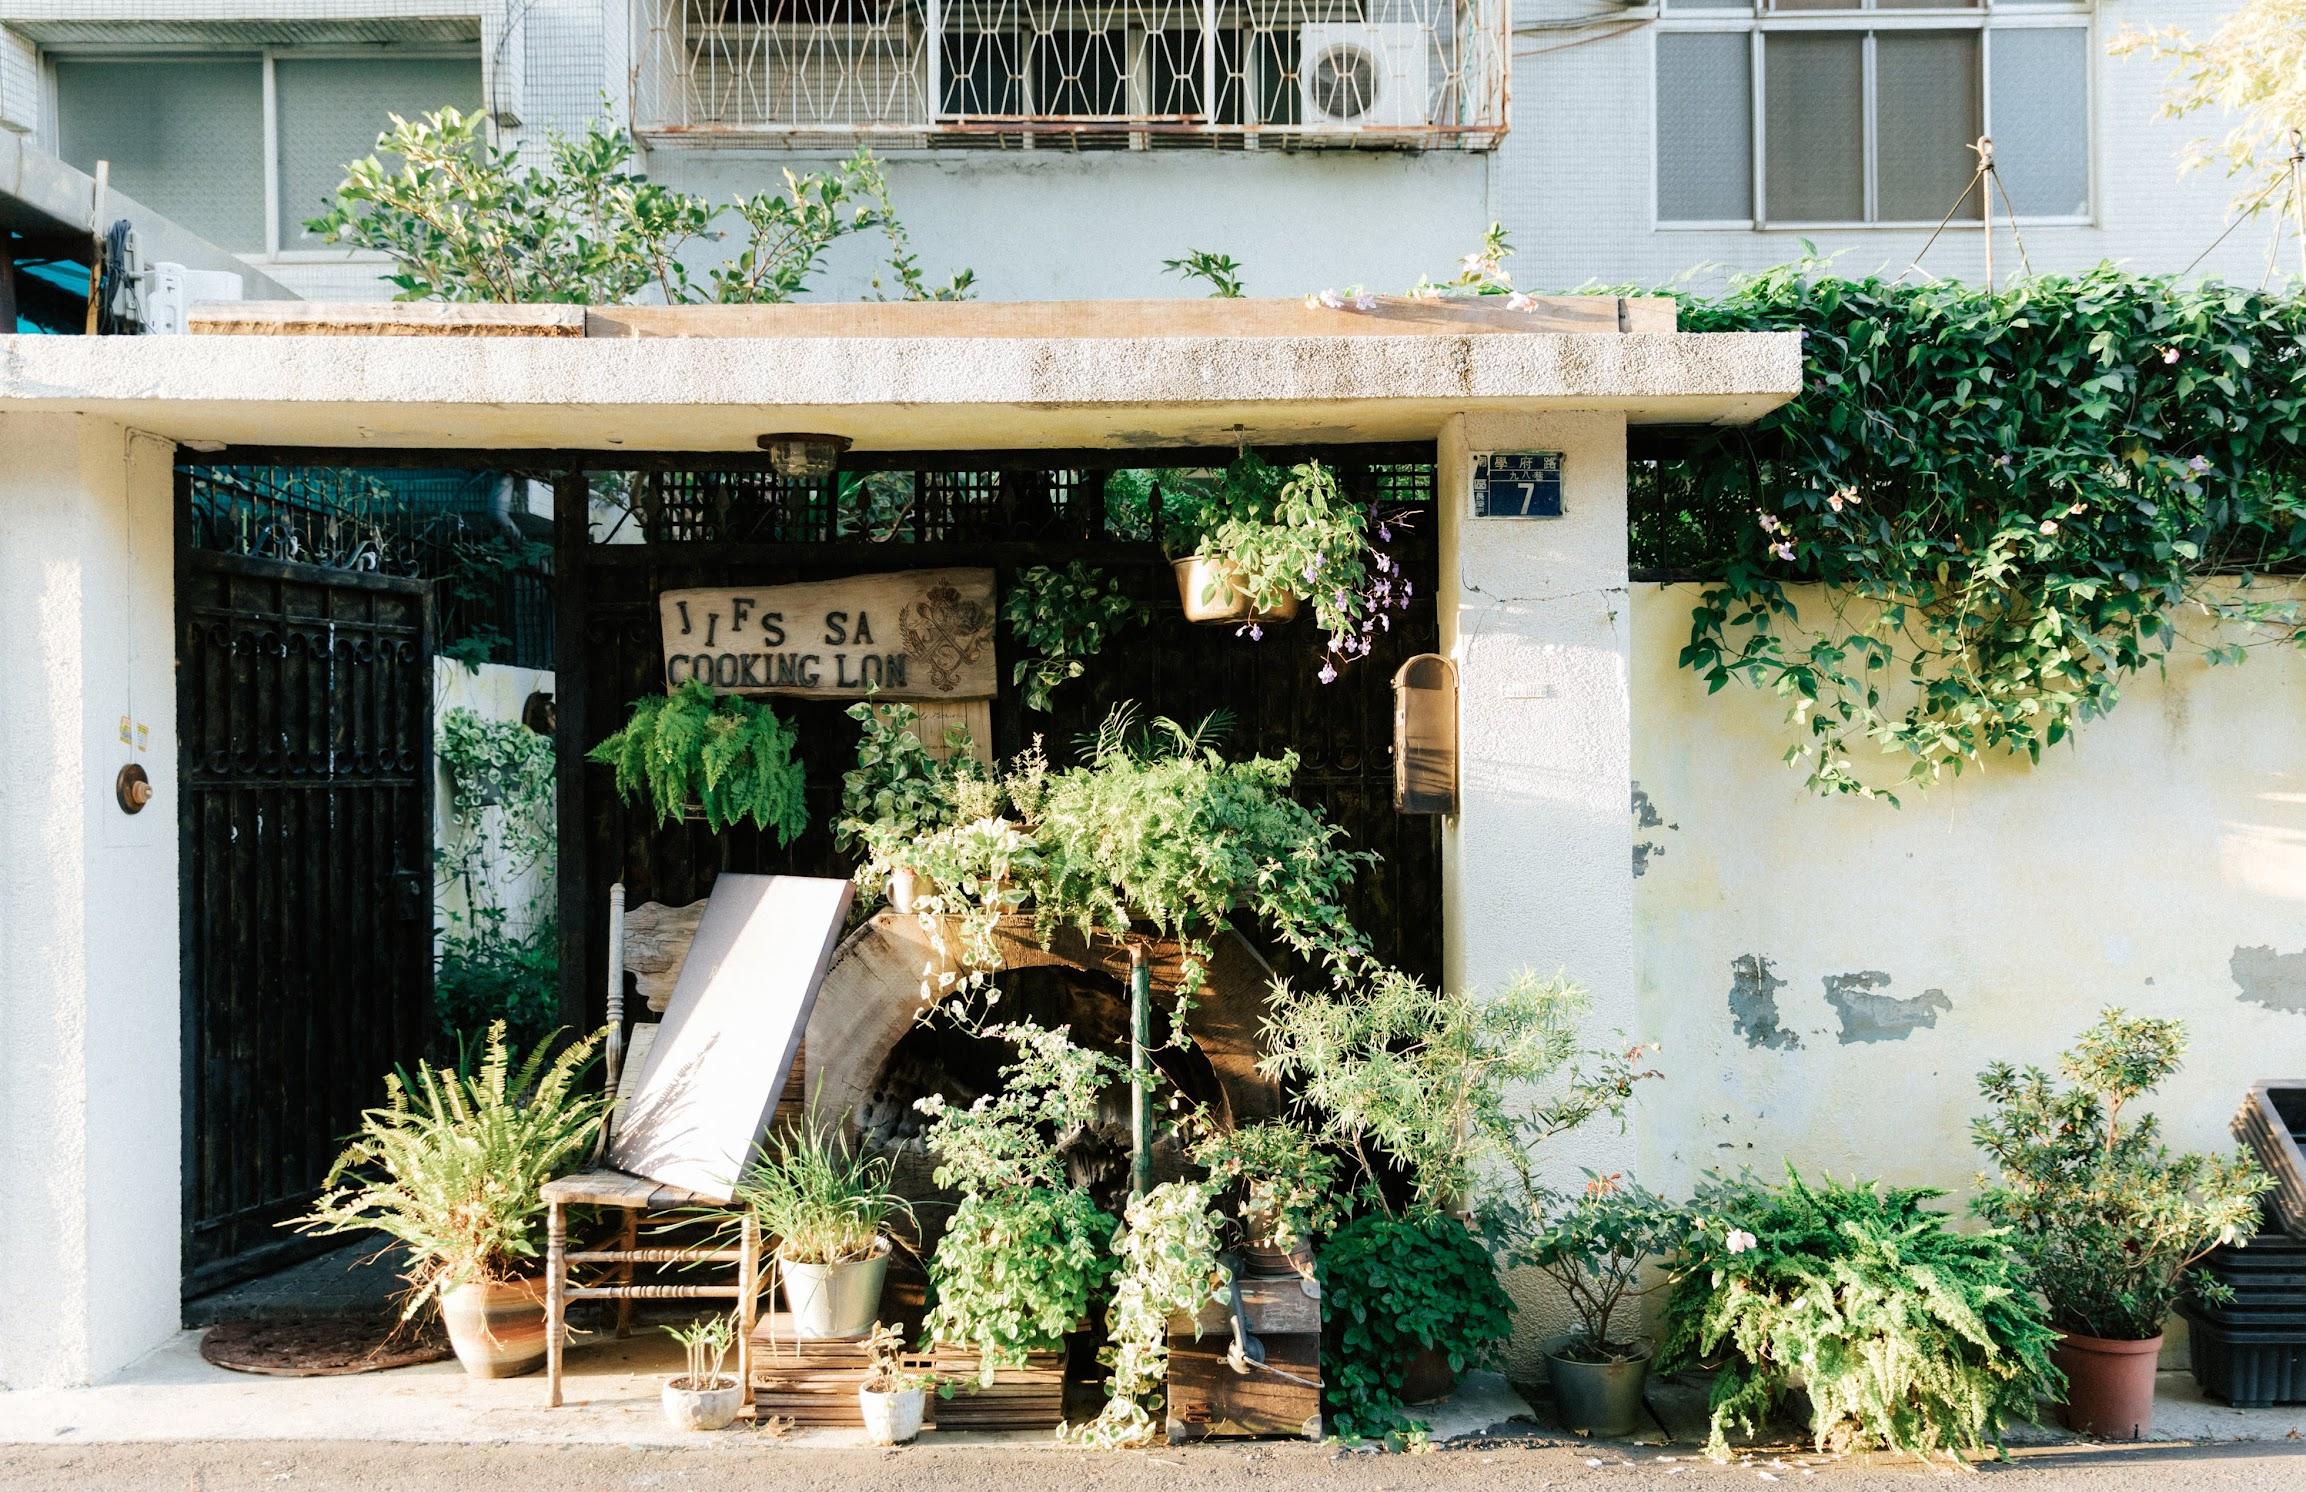 Jifs Cooking Salon的小型婚禮場地